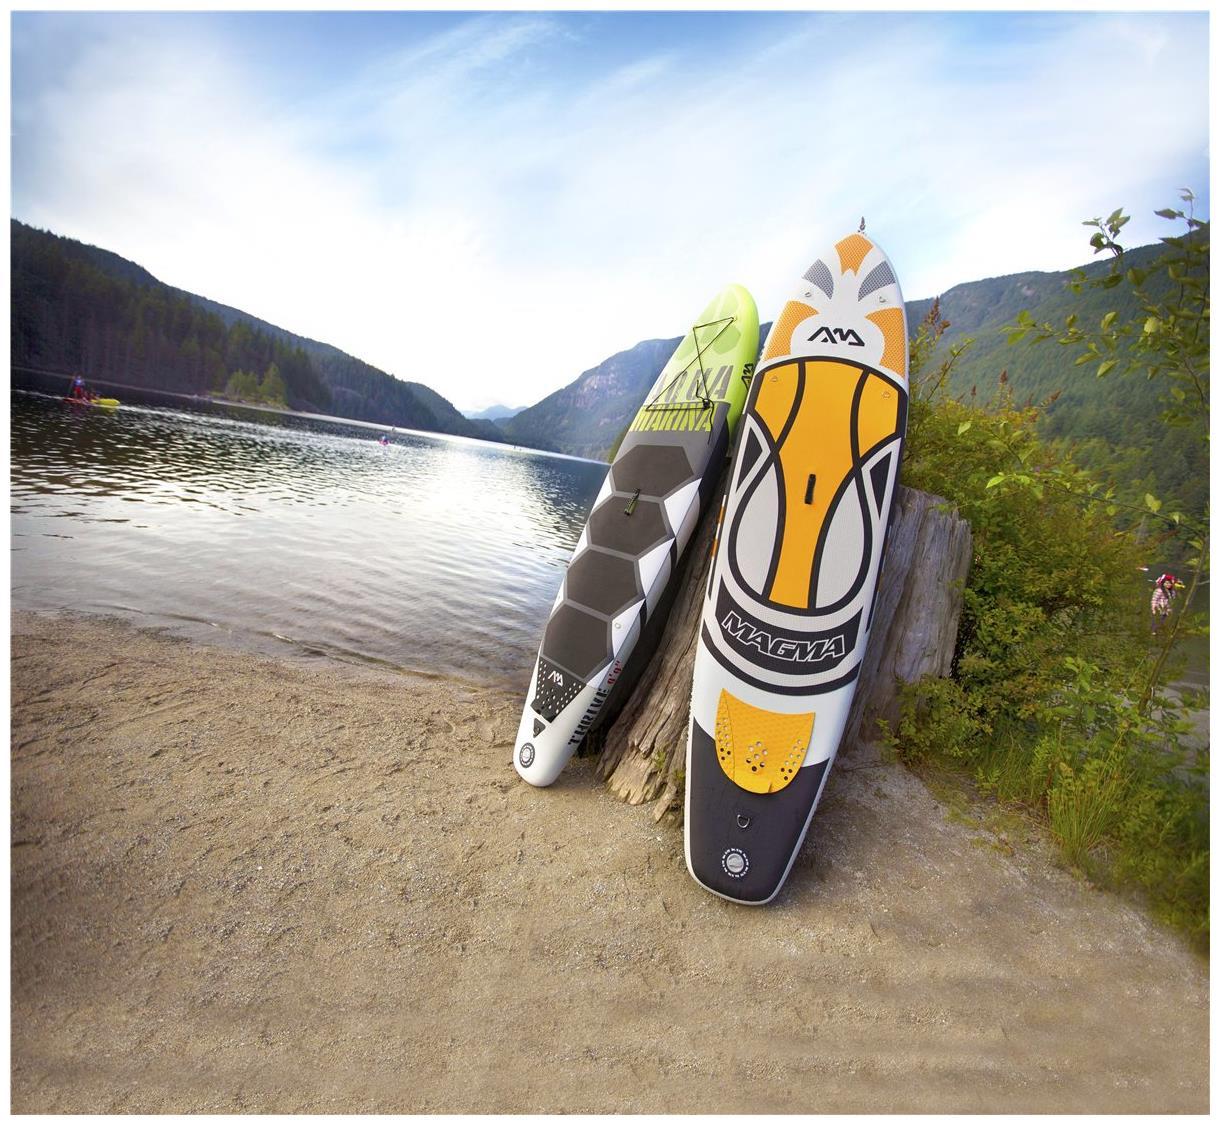 aqua marina magma stand up paddle board sup inflatable isup carbon paddle ebay. Black Bedroom Furniture Sets. Home Design Ideas